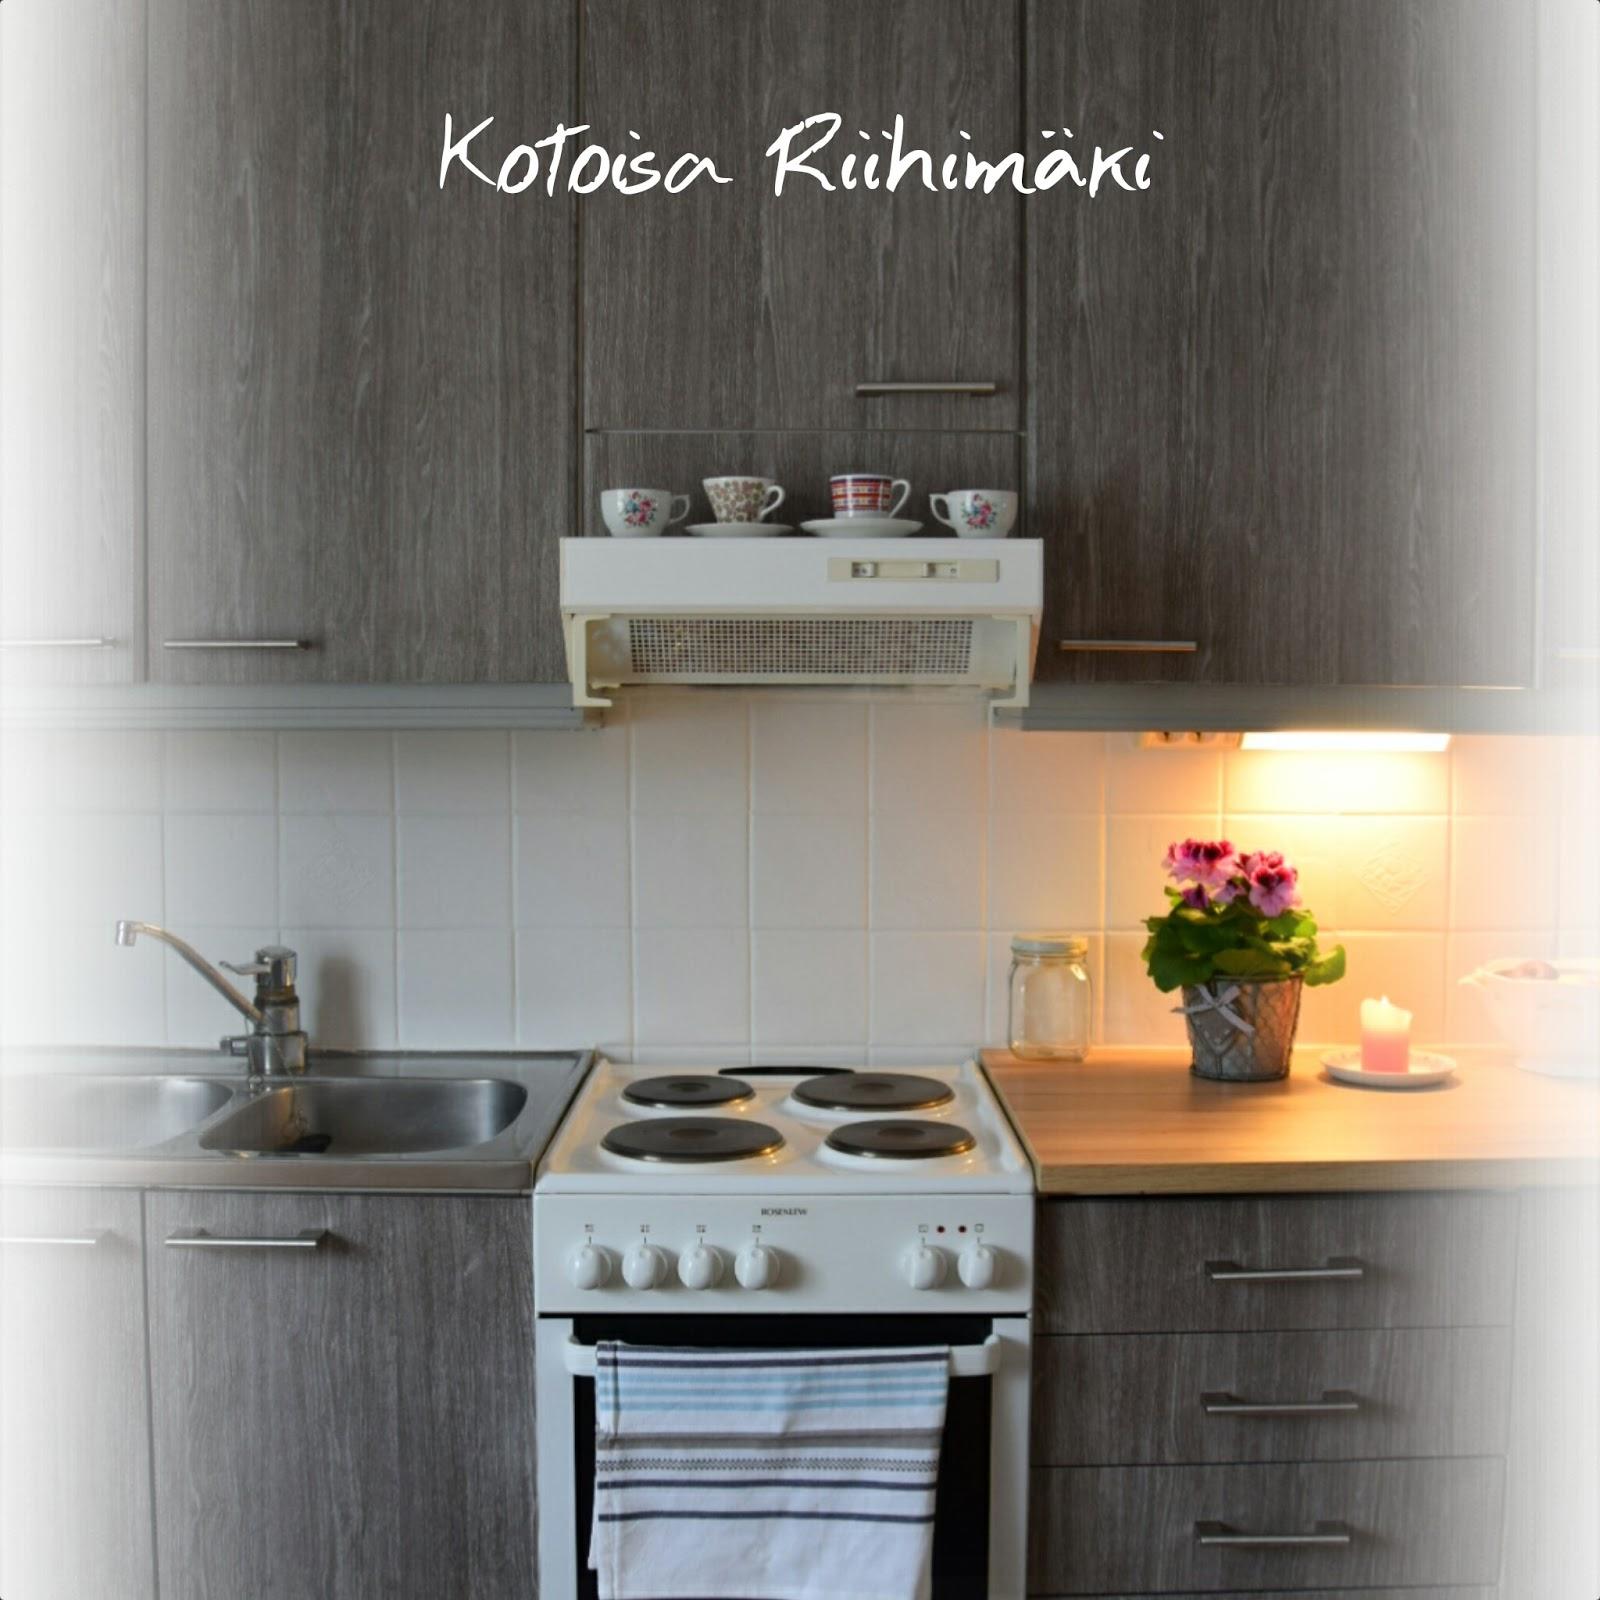 Kotoisa Riihimäki DIY uudistettu keittiö dc fix muovilla